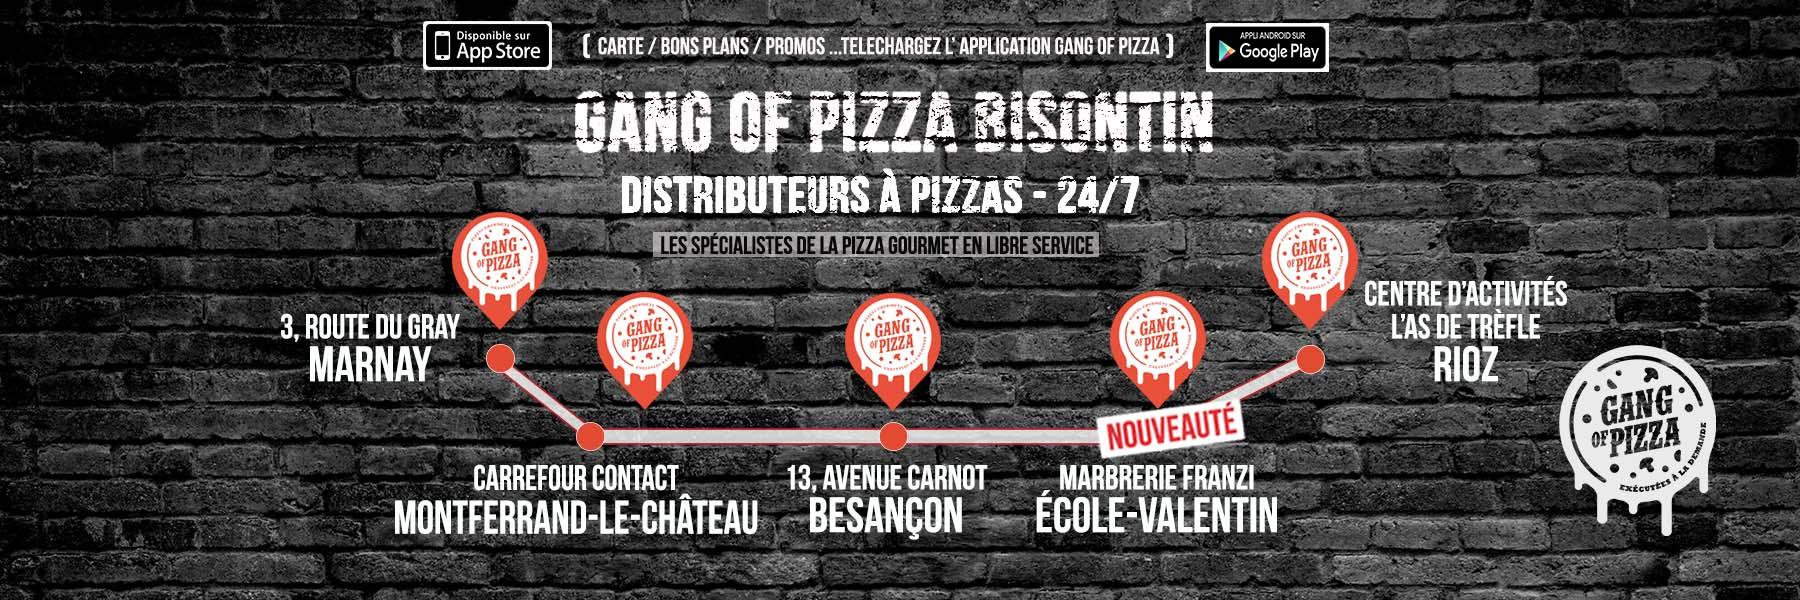 couverture-facebook-rioz-ecole-valentin-marnay-montferrand-le-chateau-besancon-gang-of-pizza-24-7